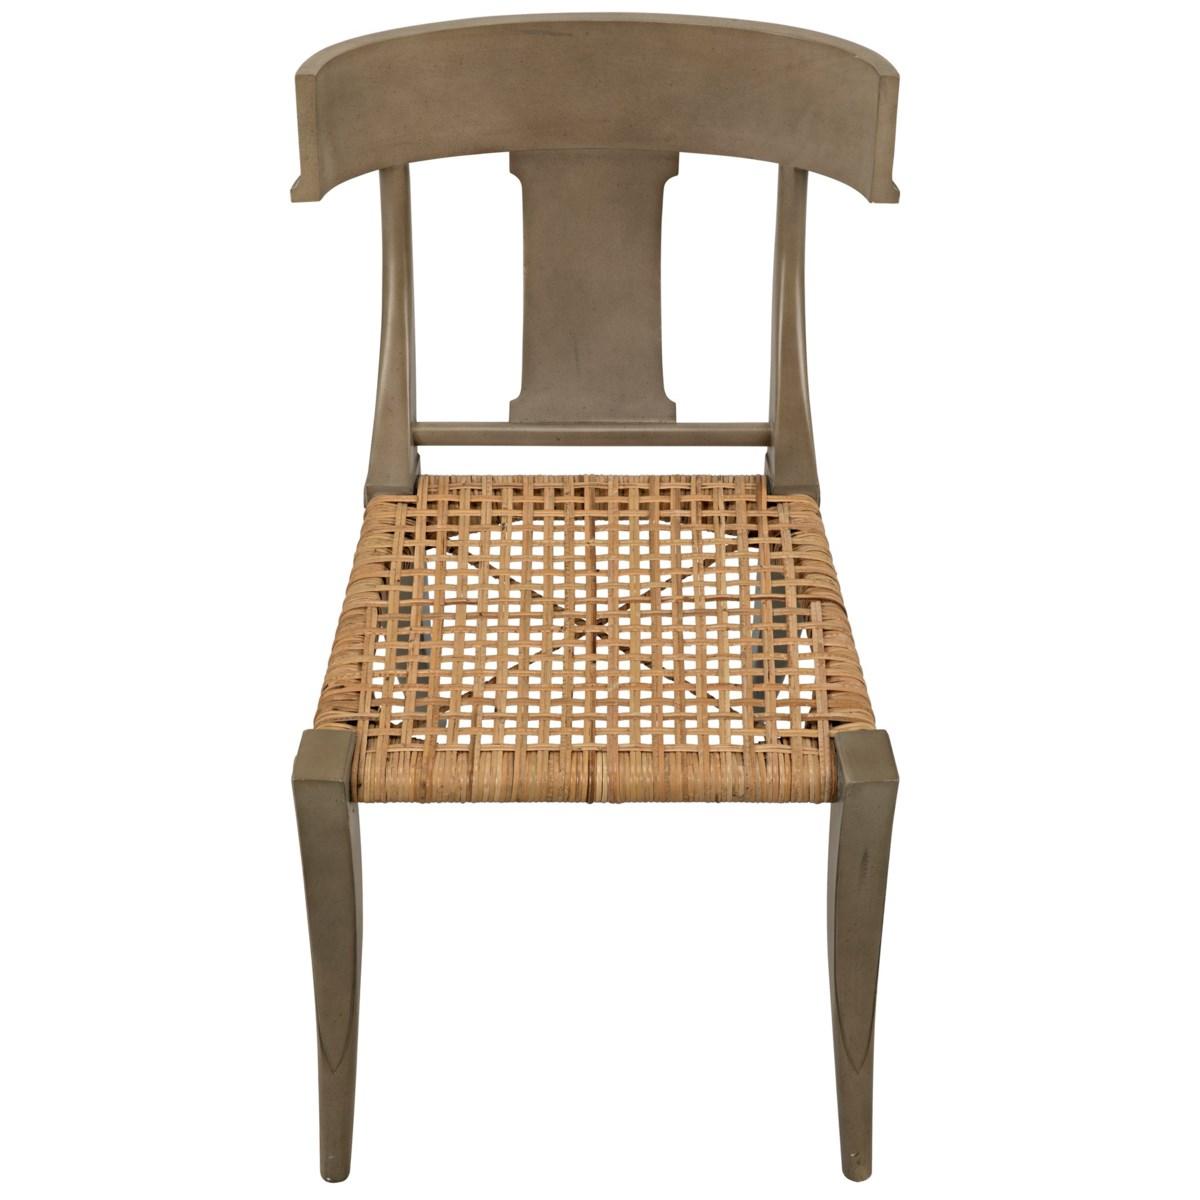 Layton Chair with Rattan, Dusk